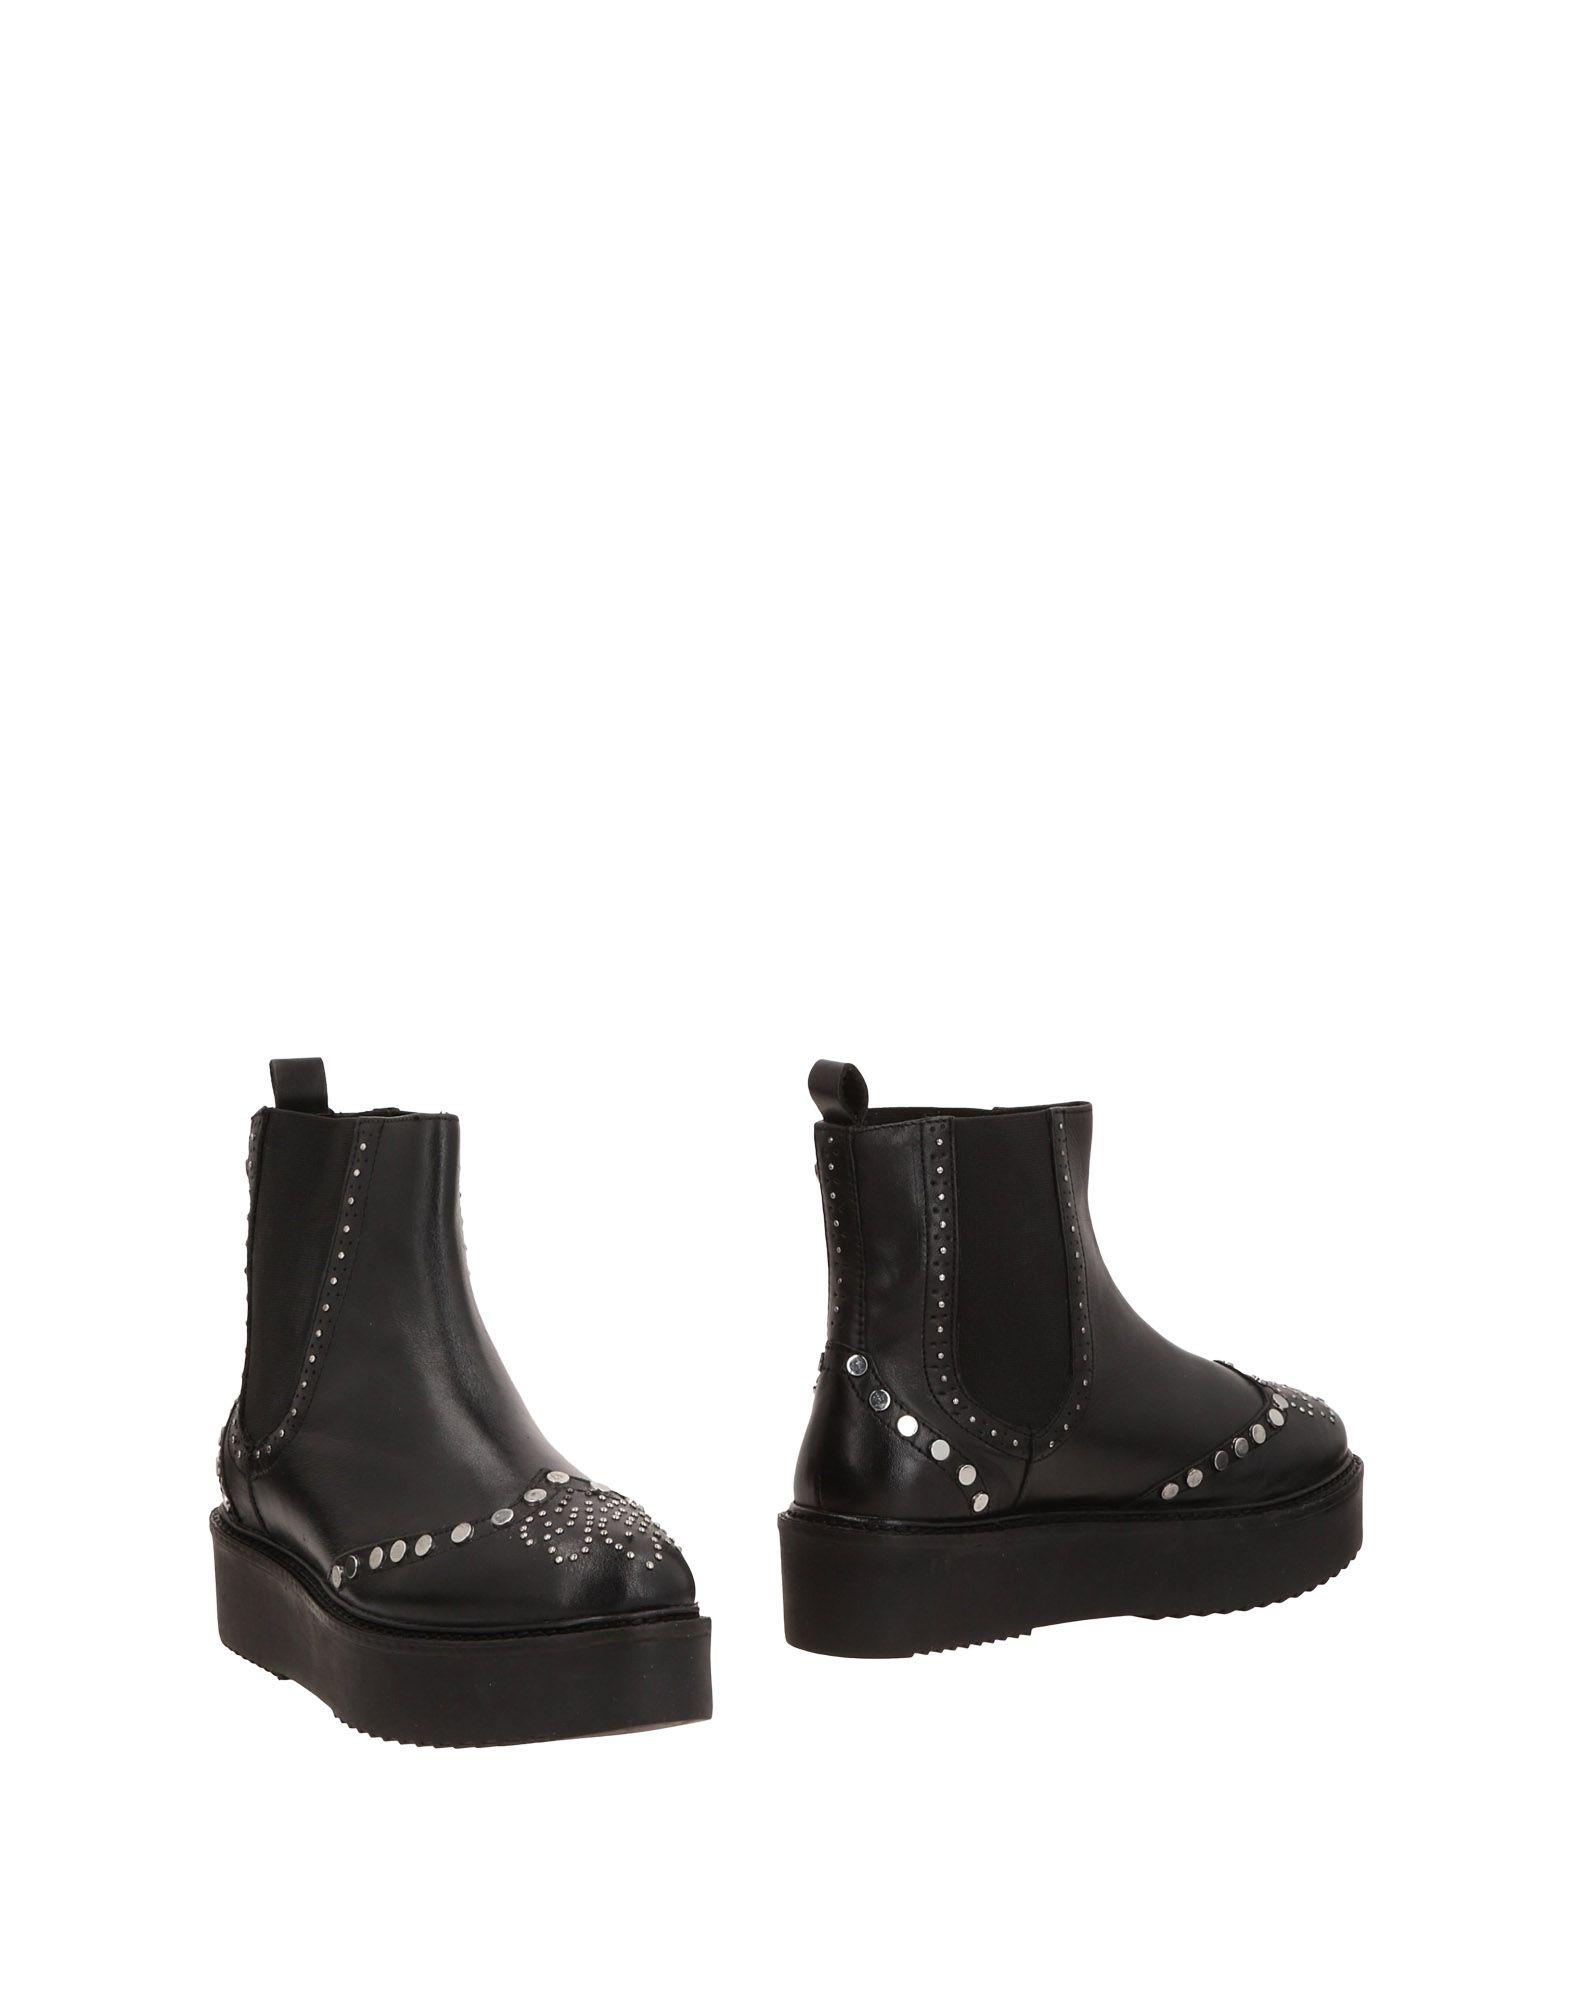 Gioseppo Chelsea Boots Damen beliebte  11461159SC Gute Qualität beliebte Damen Schuhe ae5f0e